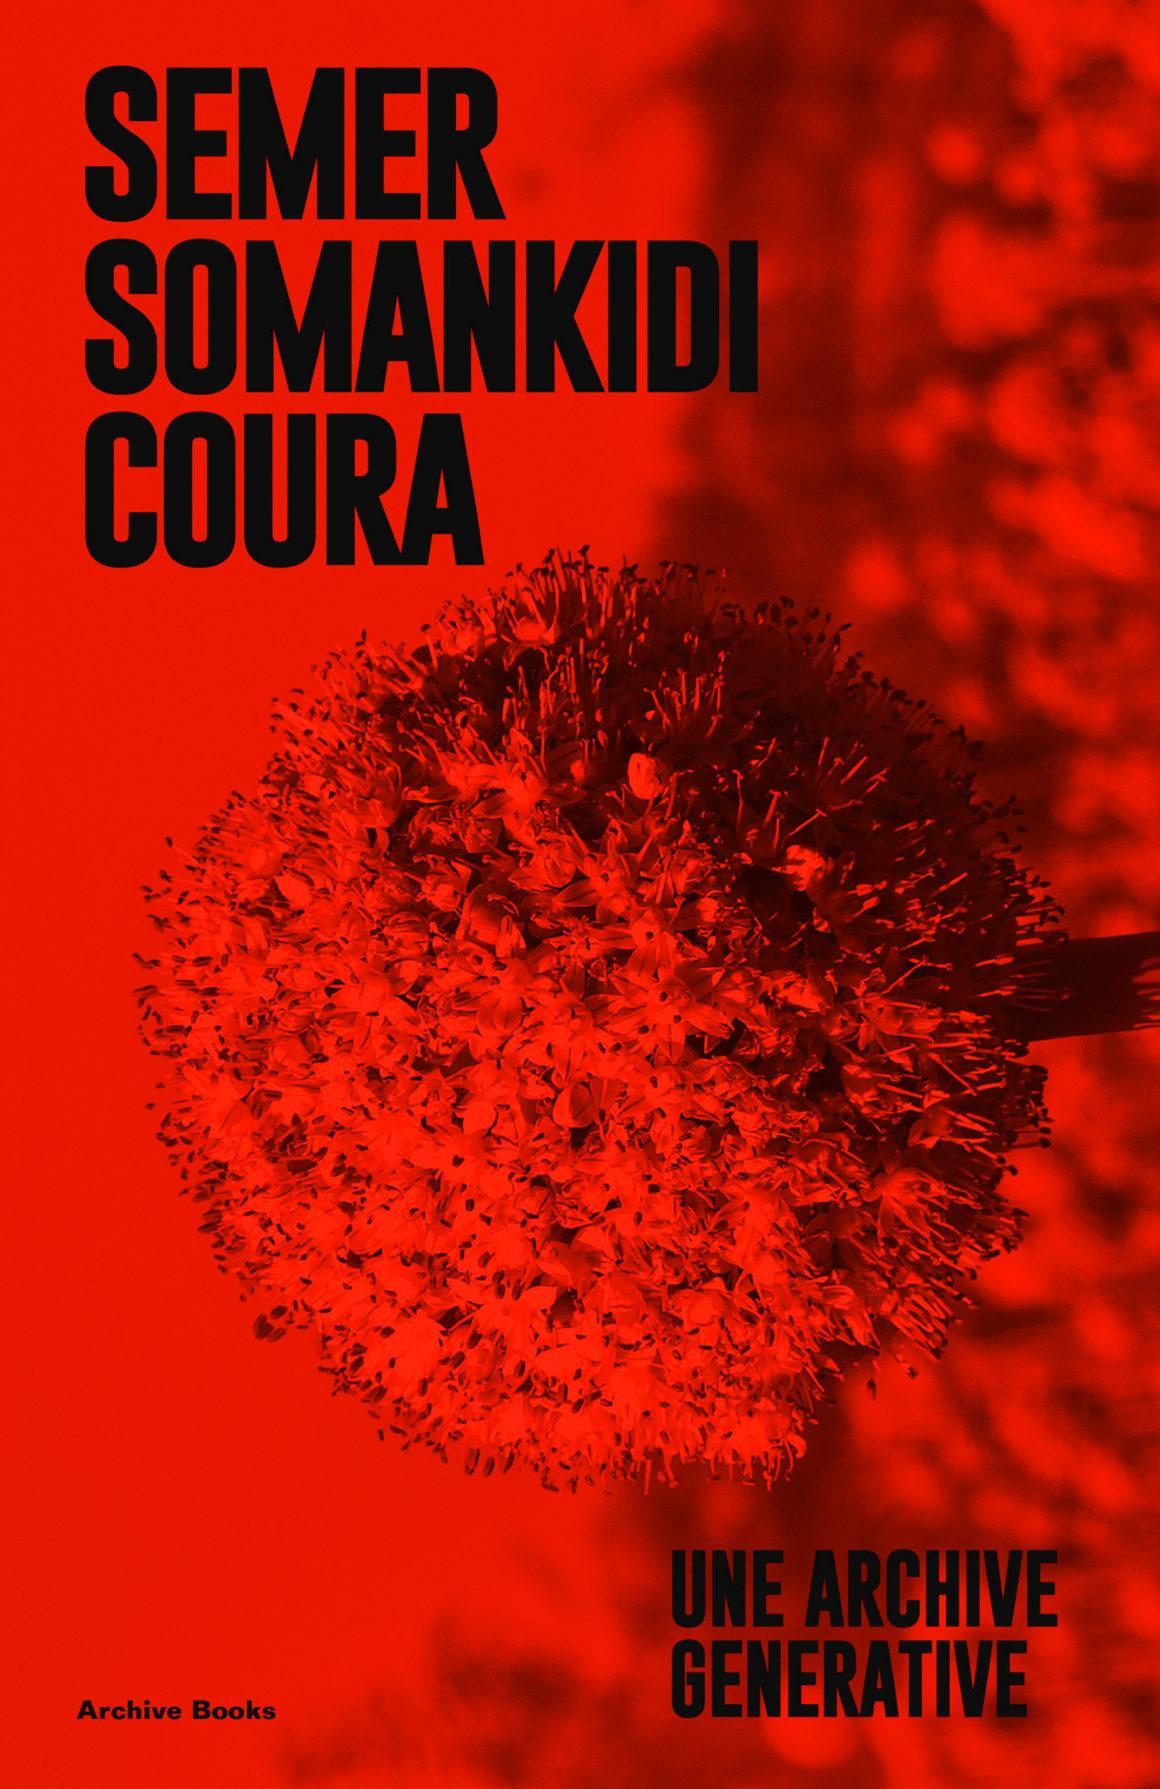 Semer Somankidi Coura